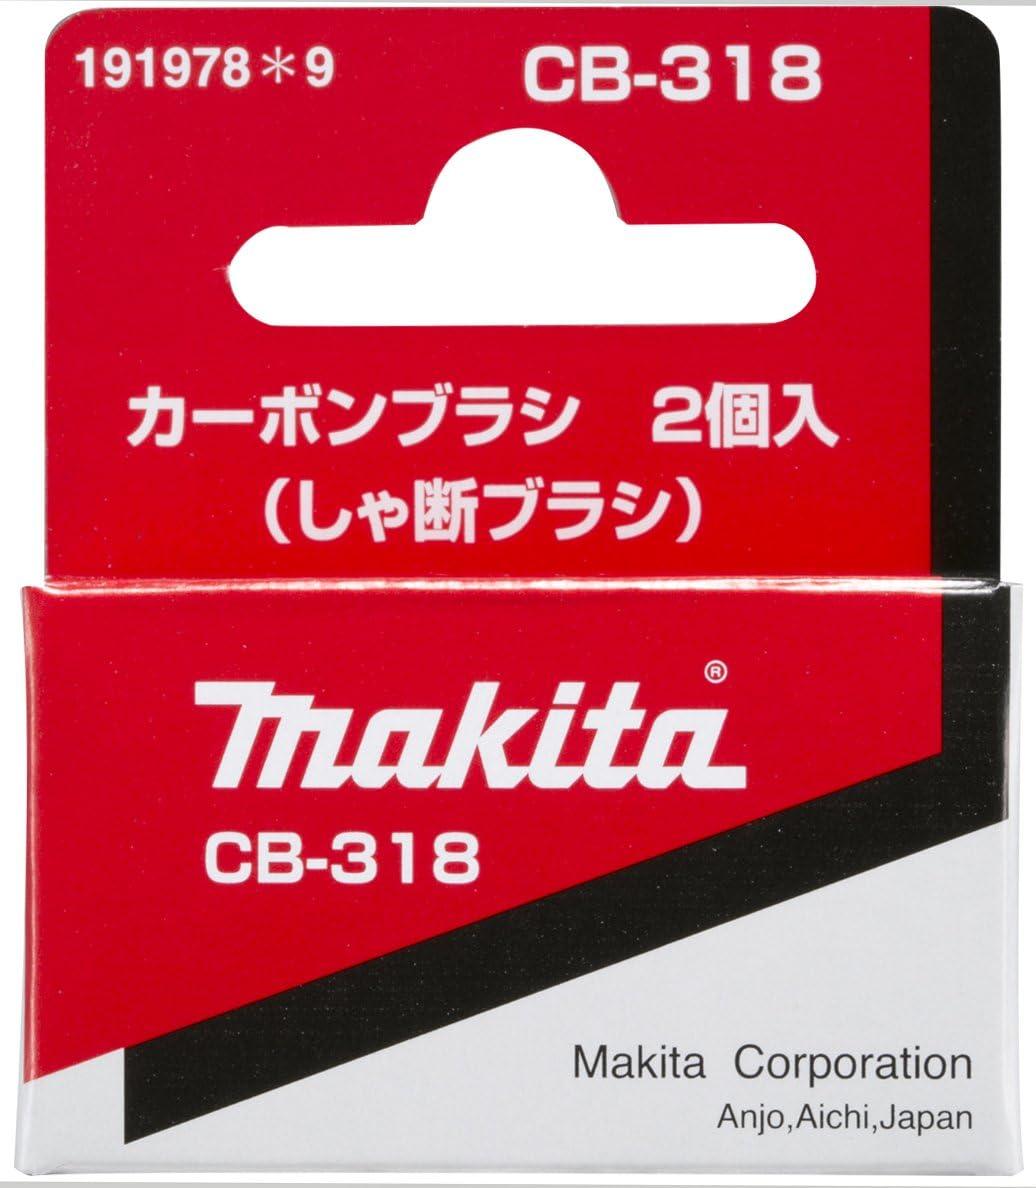 Makita 191978-9 Pinceau Cb-318